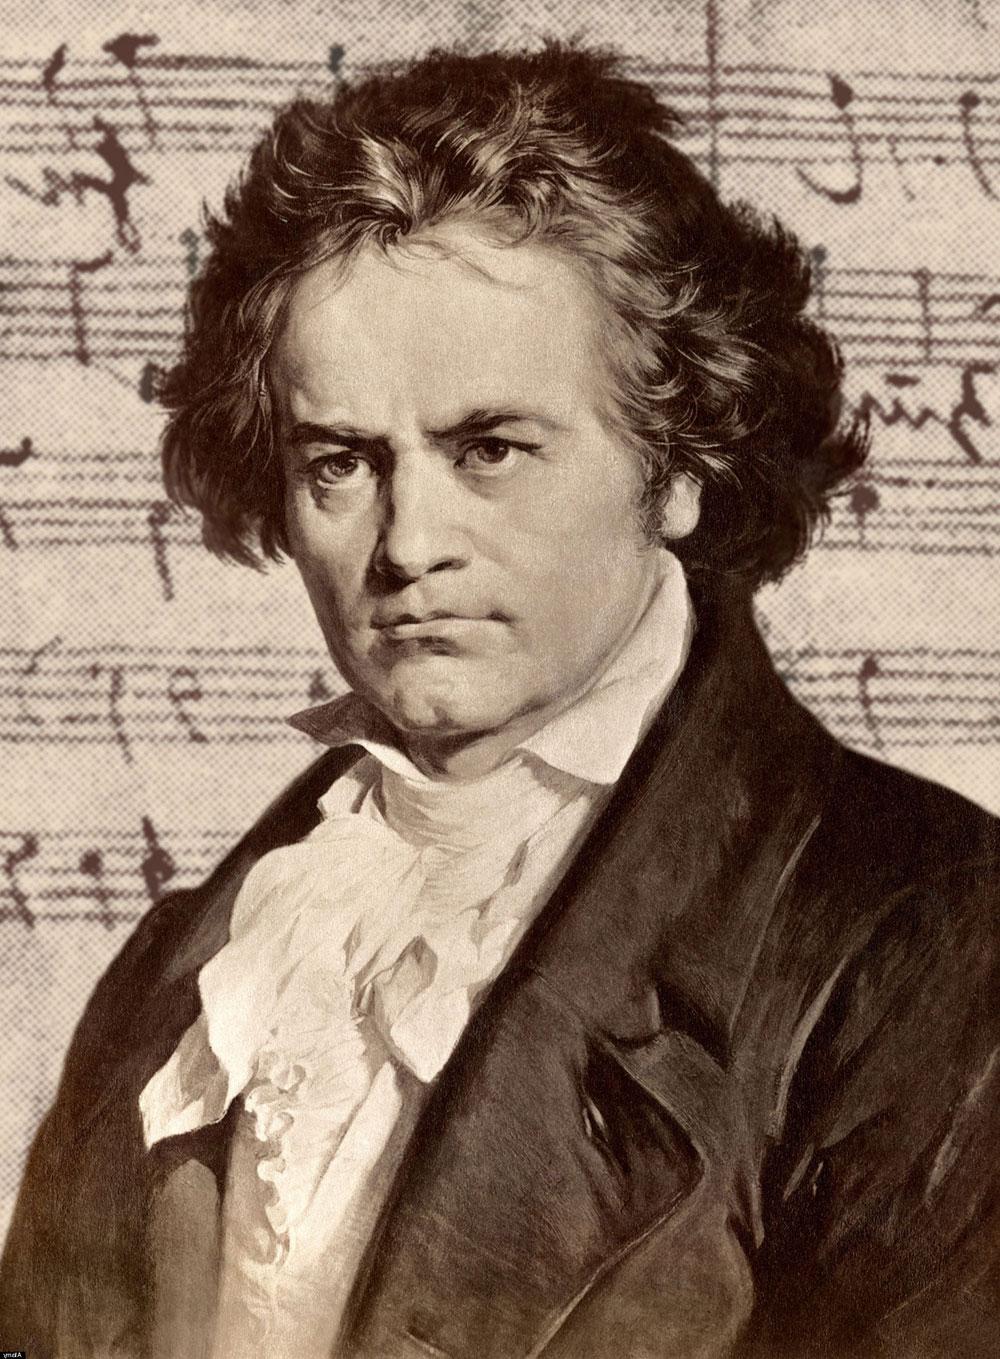 Ludwig Van Bethoven